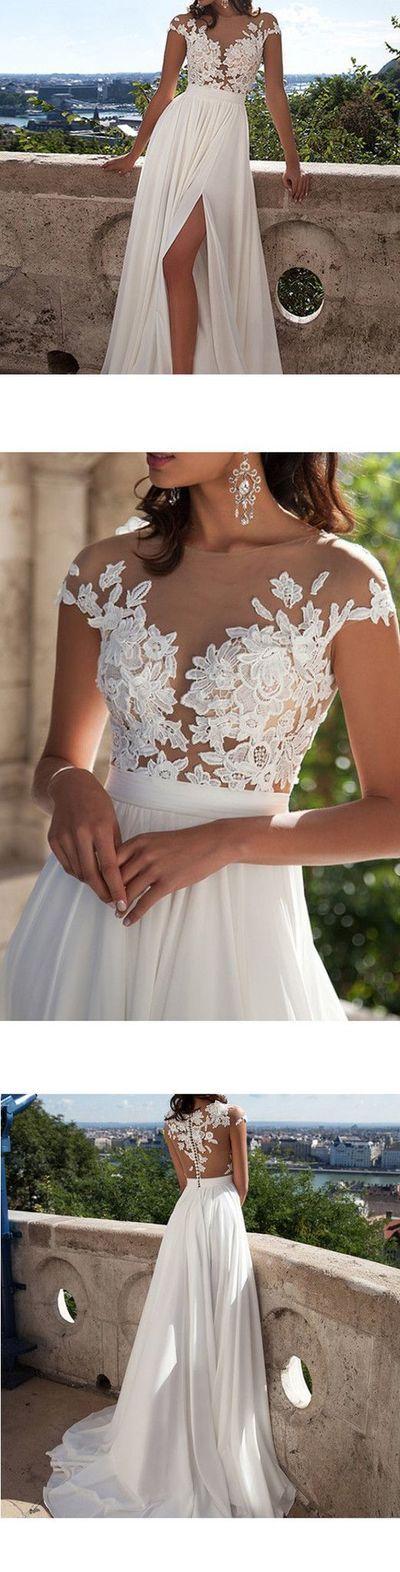 Long Top lace Appliques Side Slit Chiffon Cheap Party Evening Prom Dresses